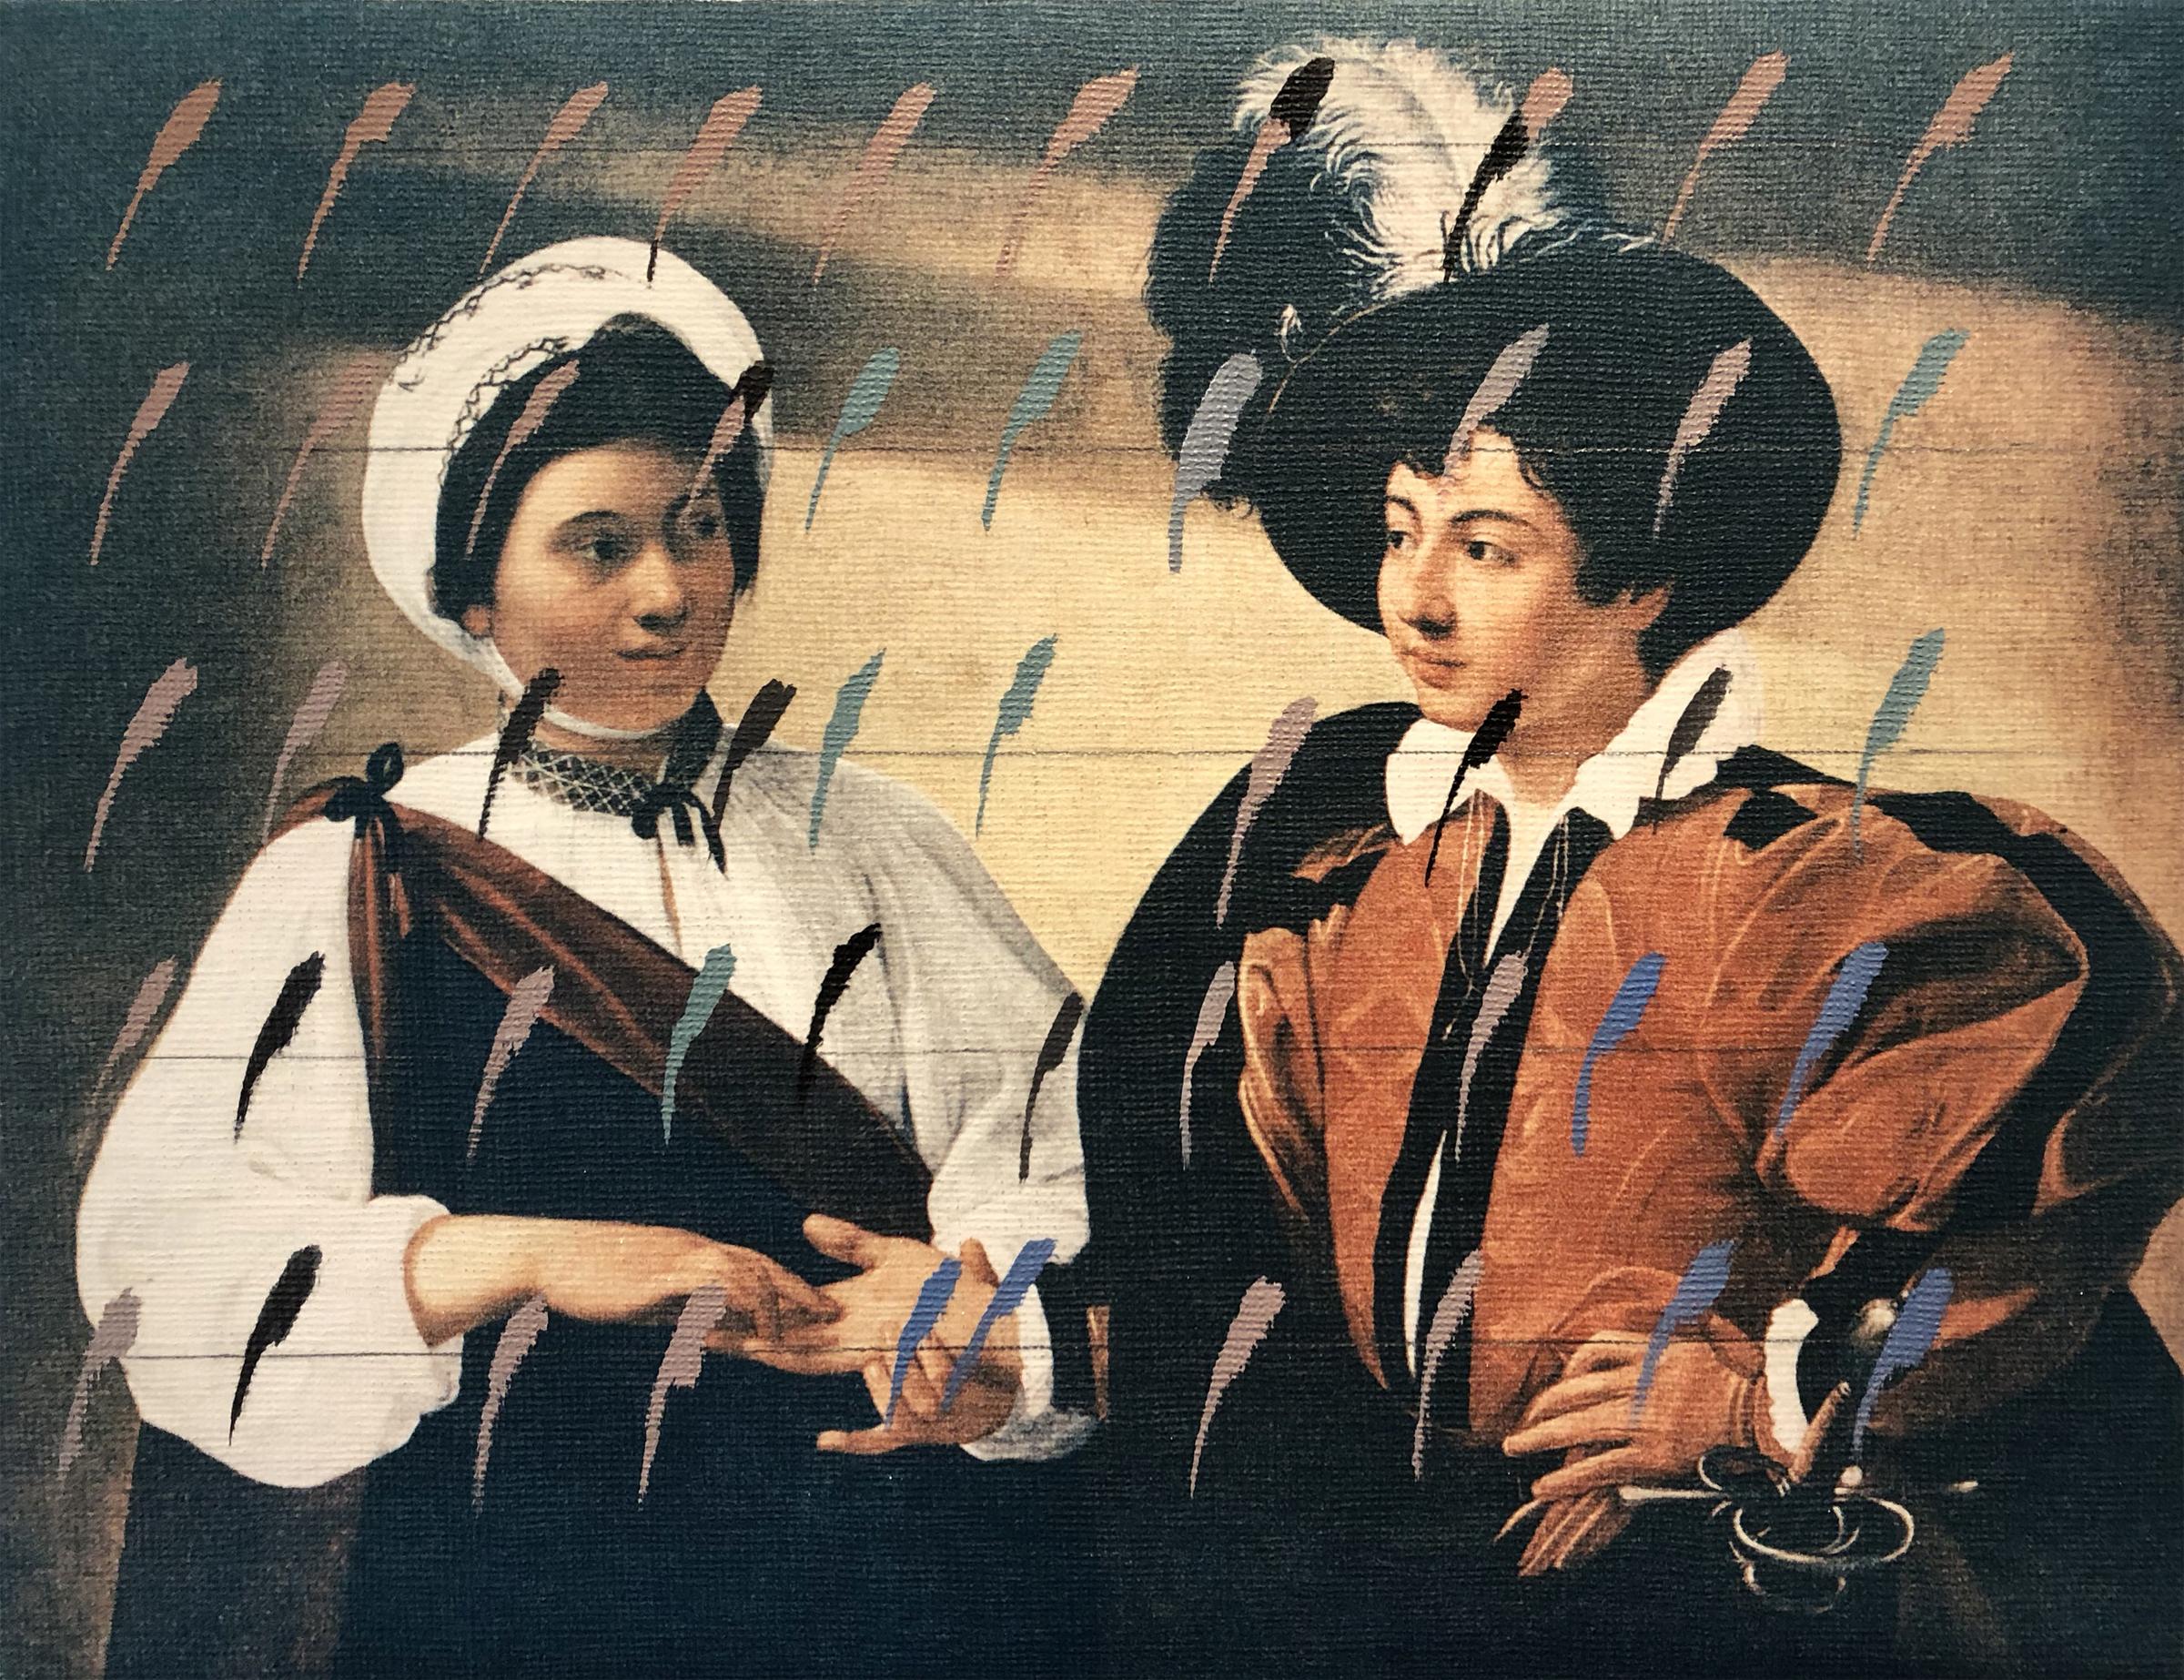 Untitled, 16 x 23 inches / 40.5 x 58.5 cm, mixed media, acrylic on burlap canvas, 1982